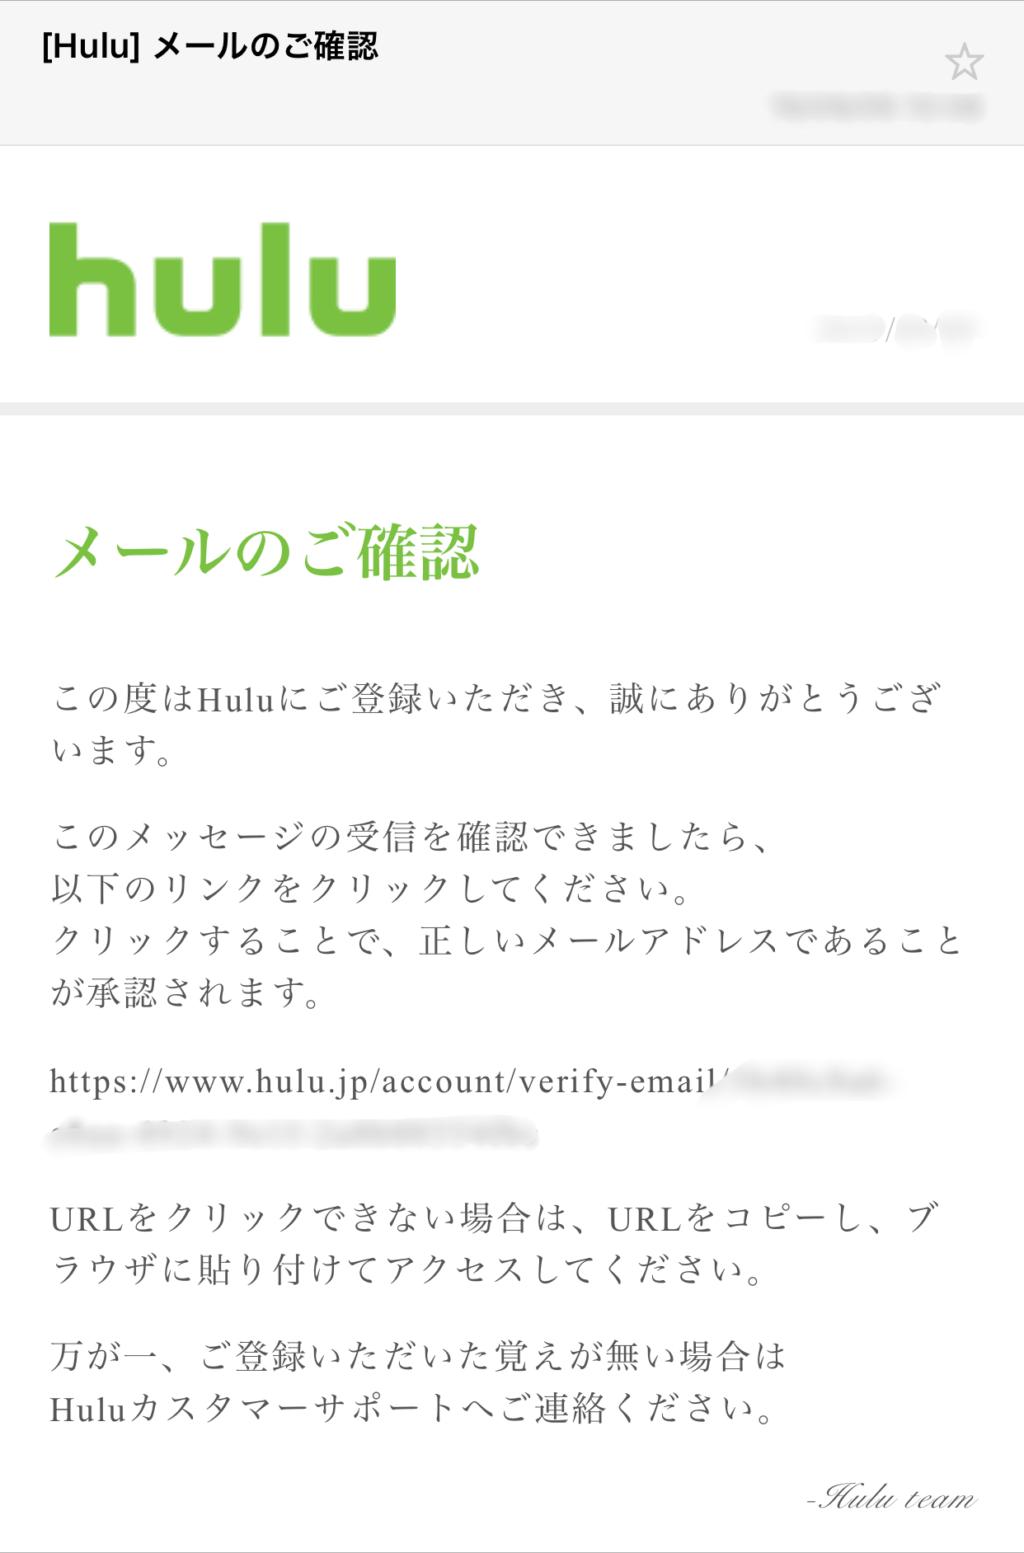 Huluをスマホから登録する方法